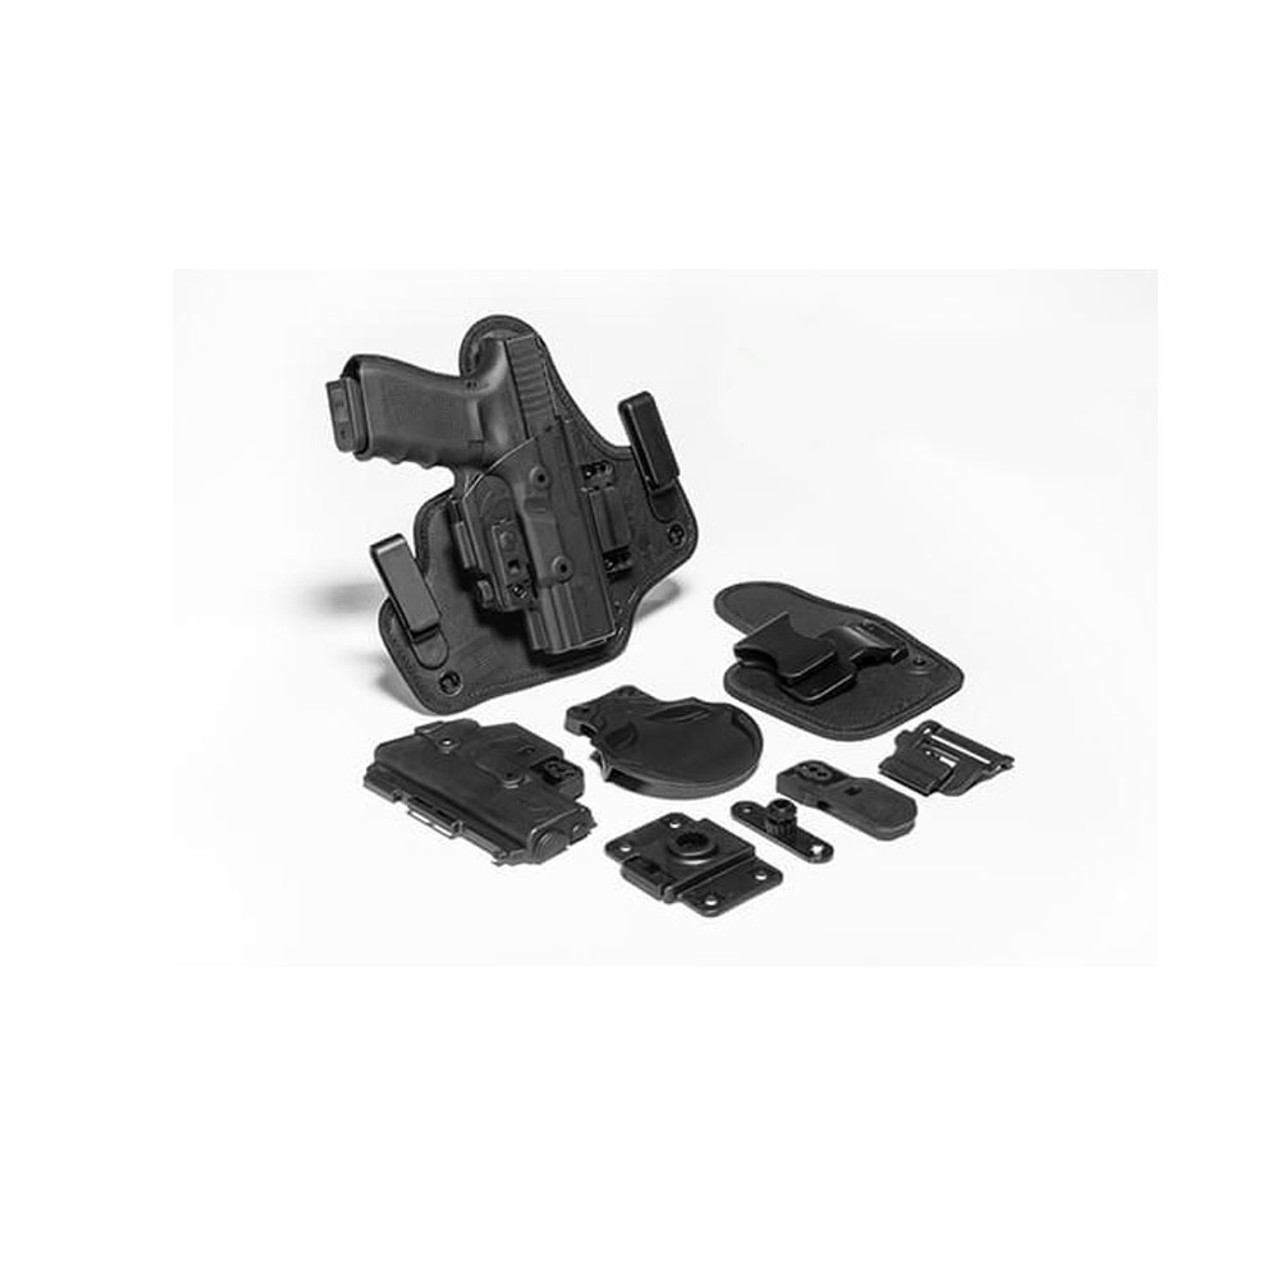 ALIEN GEAR ShapeShift Springfield XD Mod 2 3in Subcompact 9mm/ 40 RH Black  Holster Starter Kit (SSHK-0694-RH-R-15-XXX)